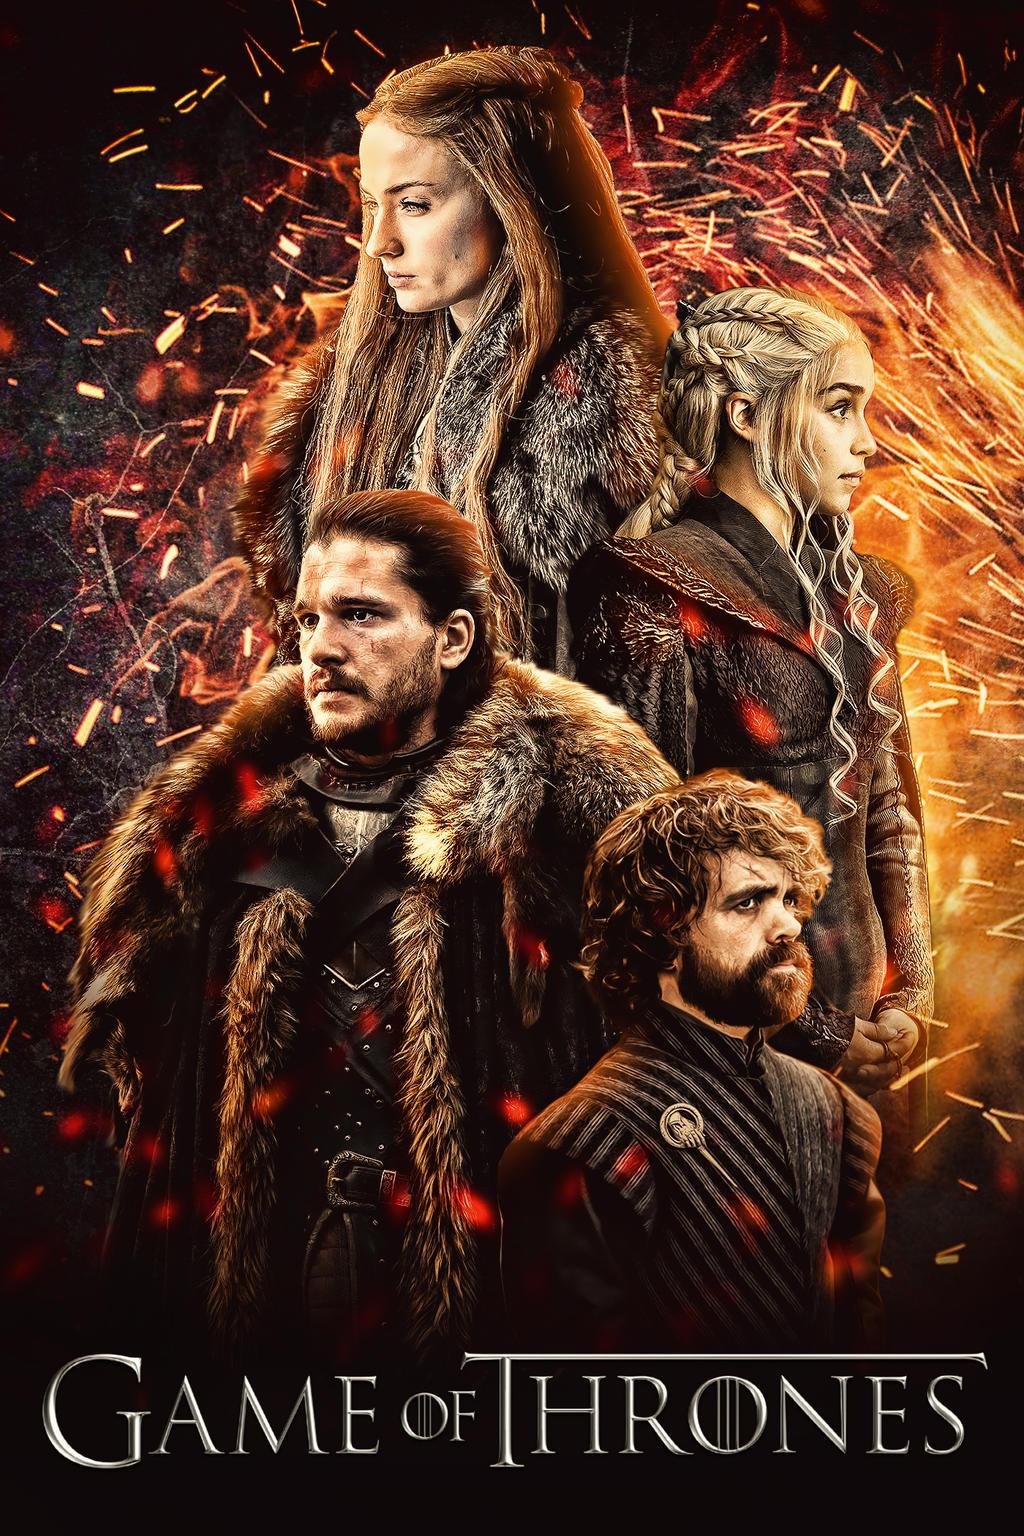 game of thrones art wallpaper - photo #40